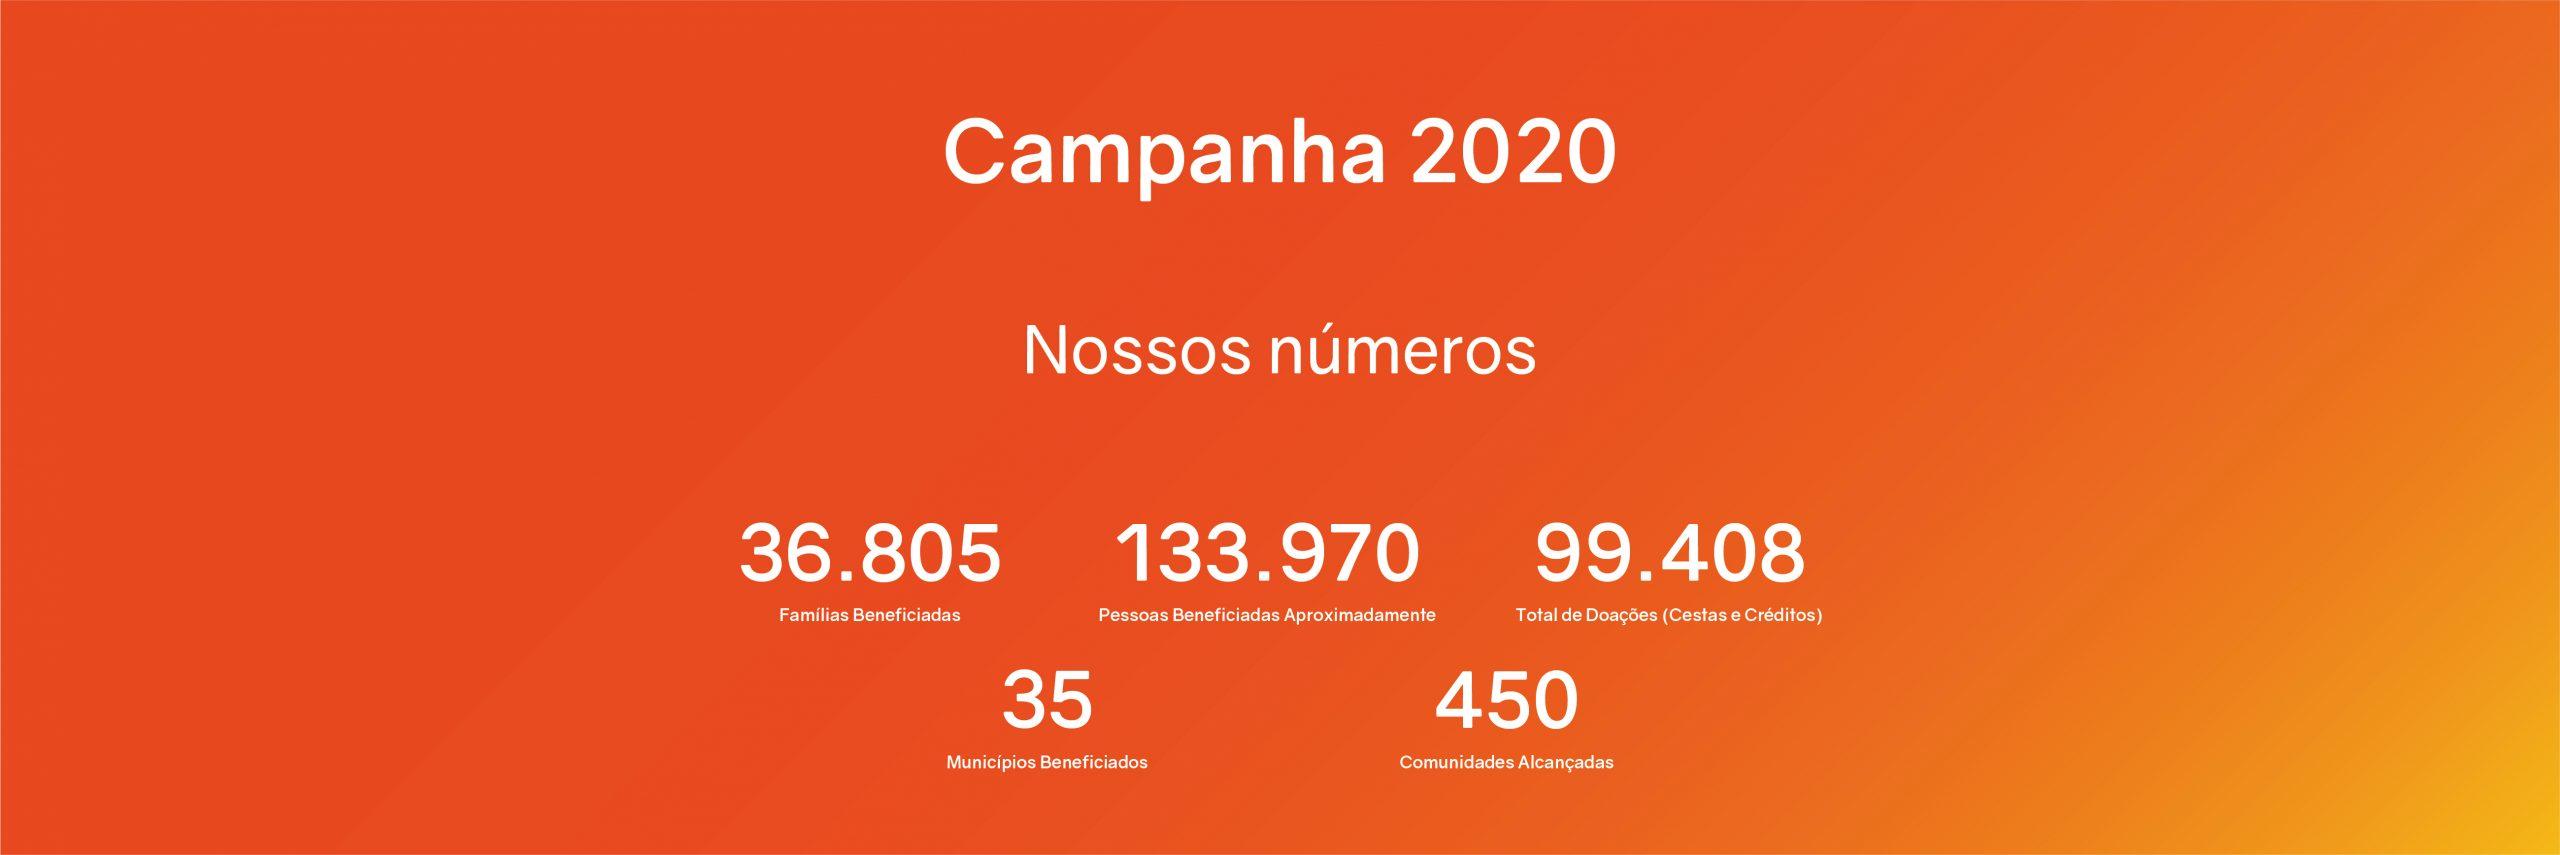 campanha 2020